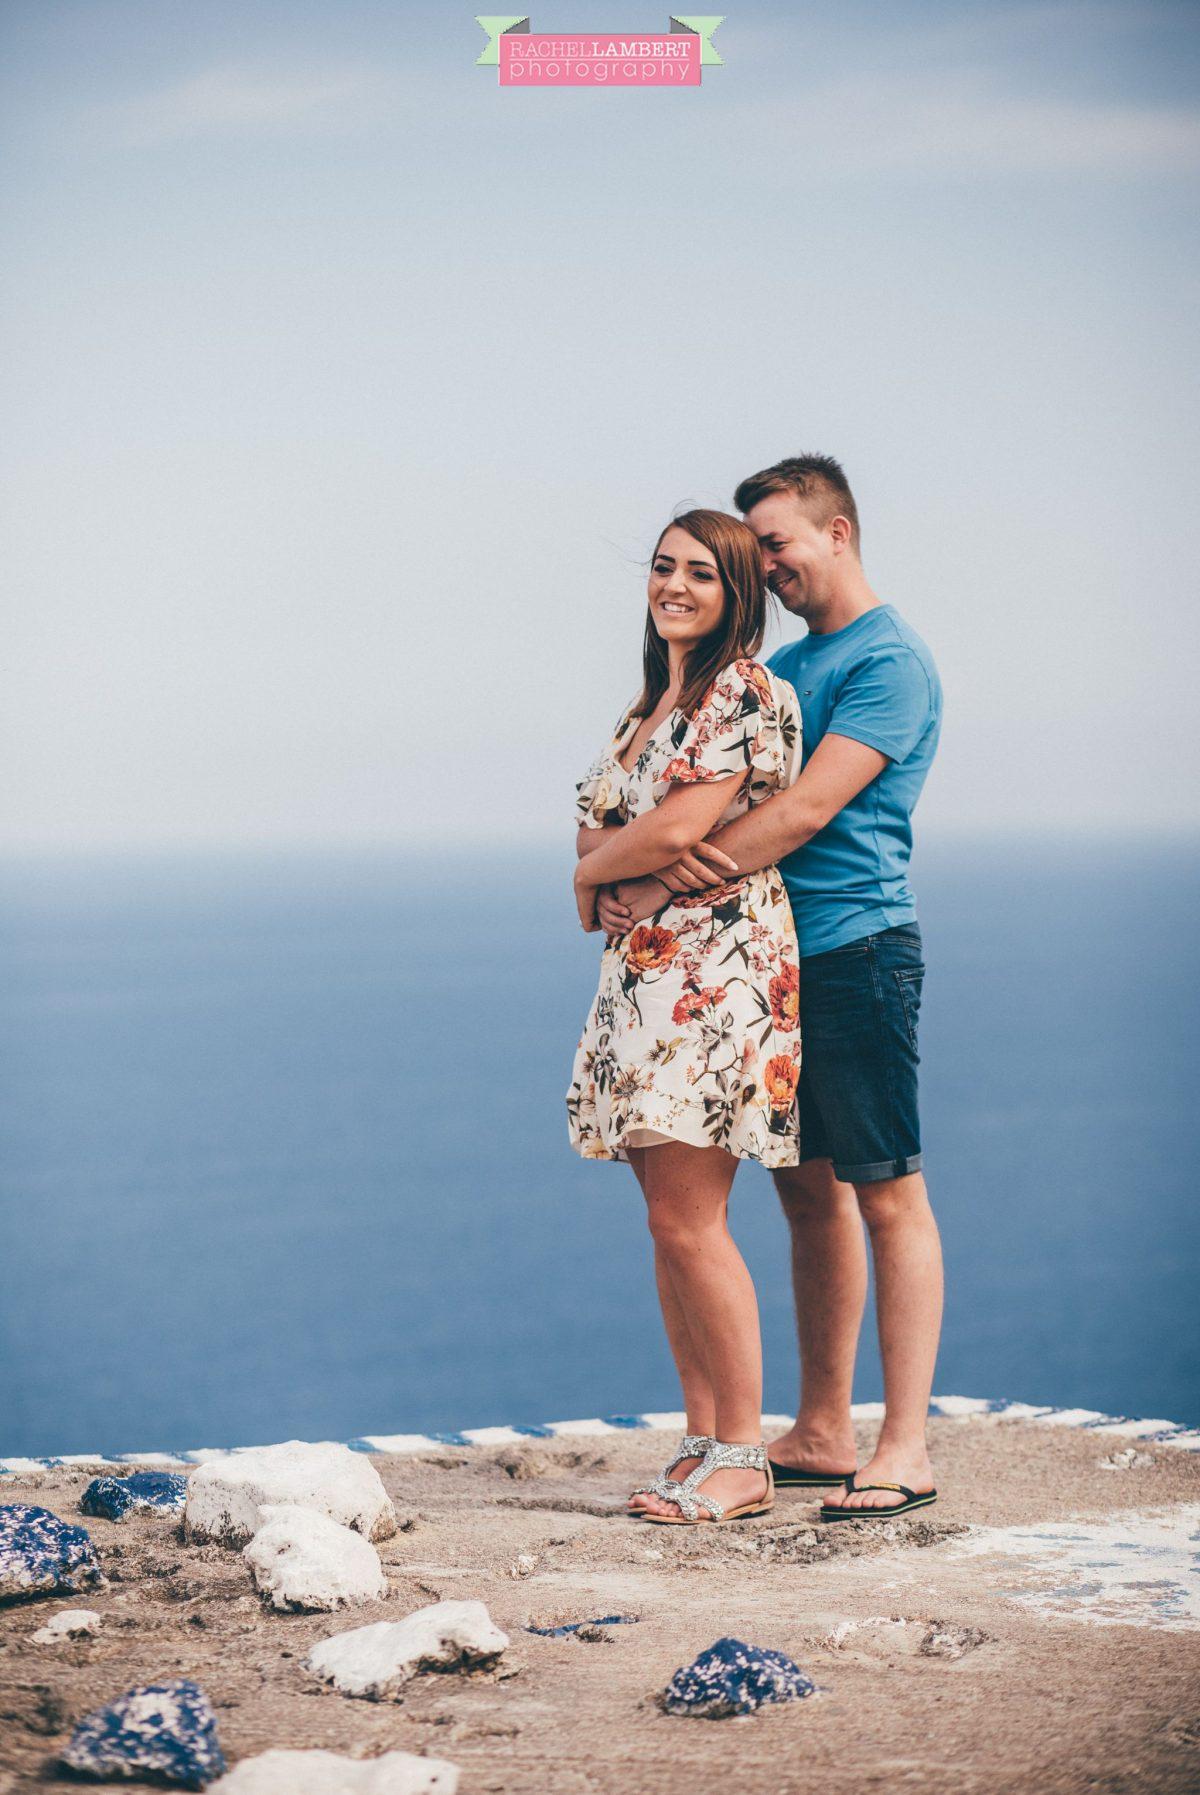 destination wedding photographer rachel lambert photography bride and groom engagement shoot monastery anthony quinn bay